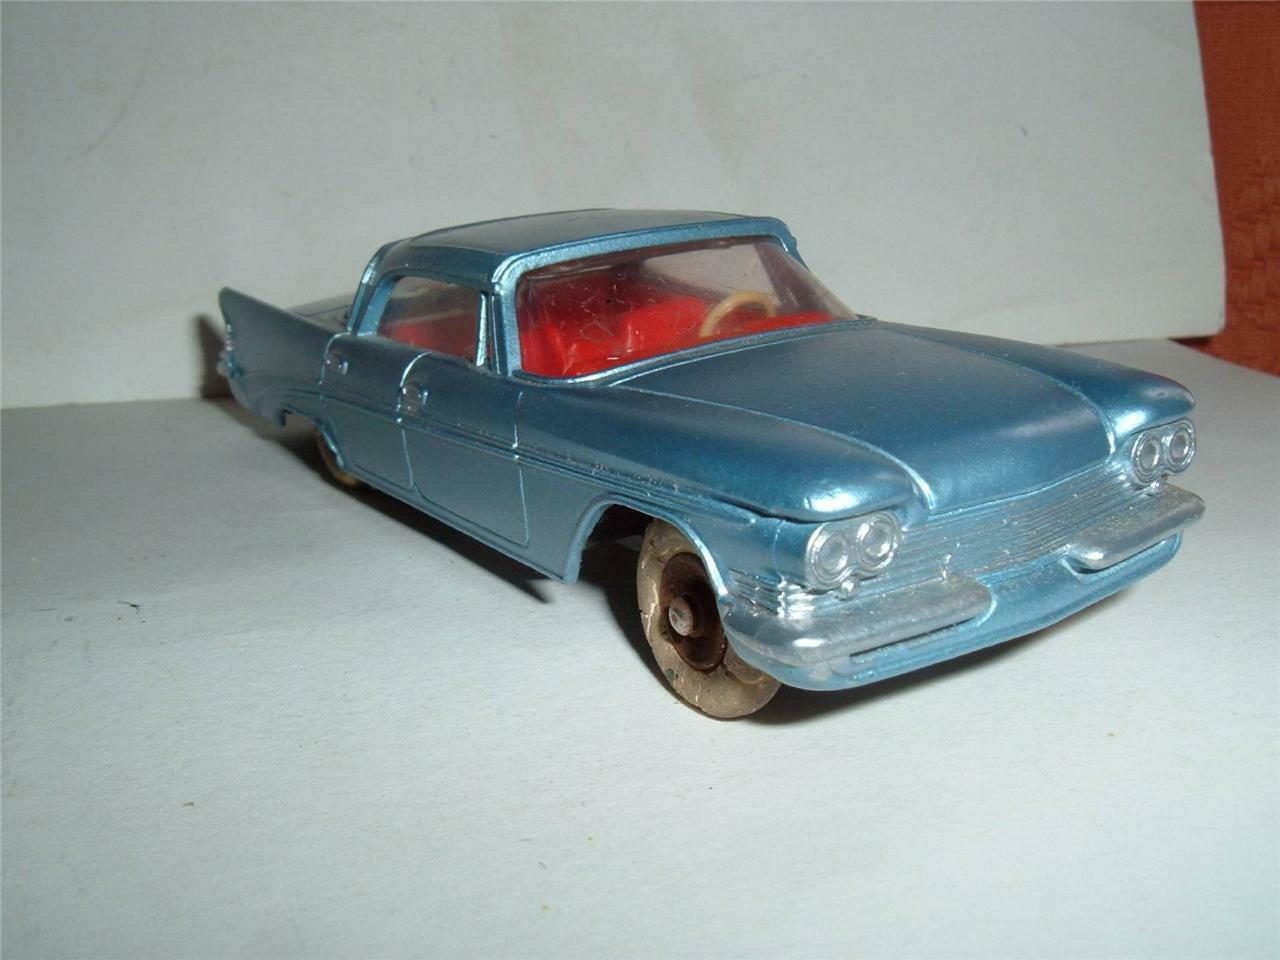 Dinky Toys 550 Chrysler saratgo en Repintado envejecido Trasero Cristal Hecho En Francia